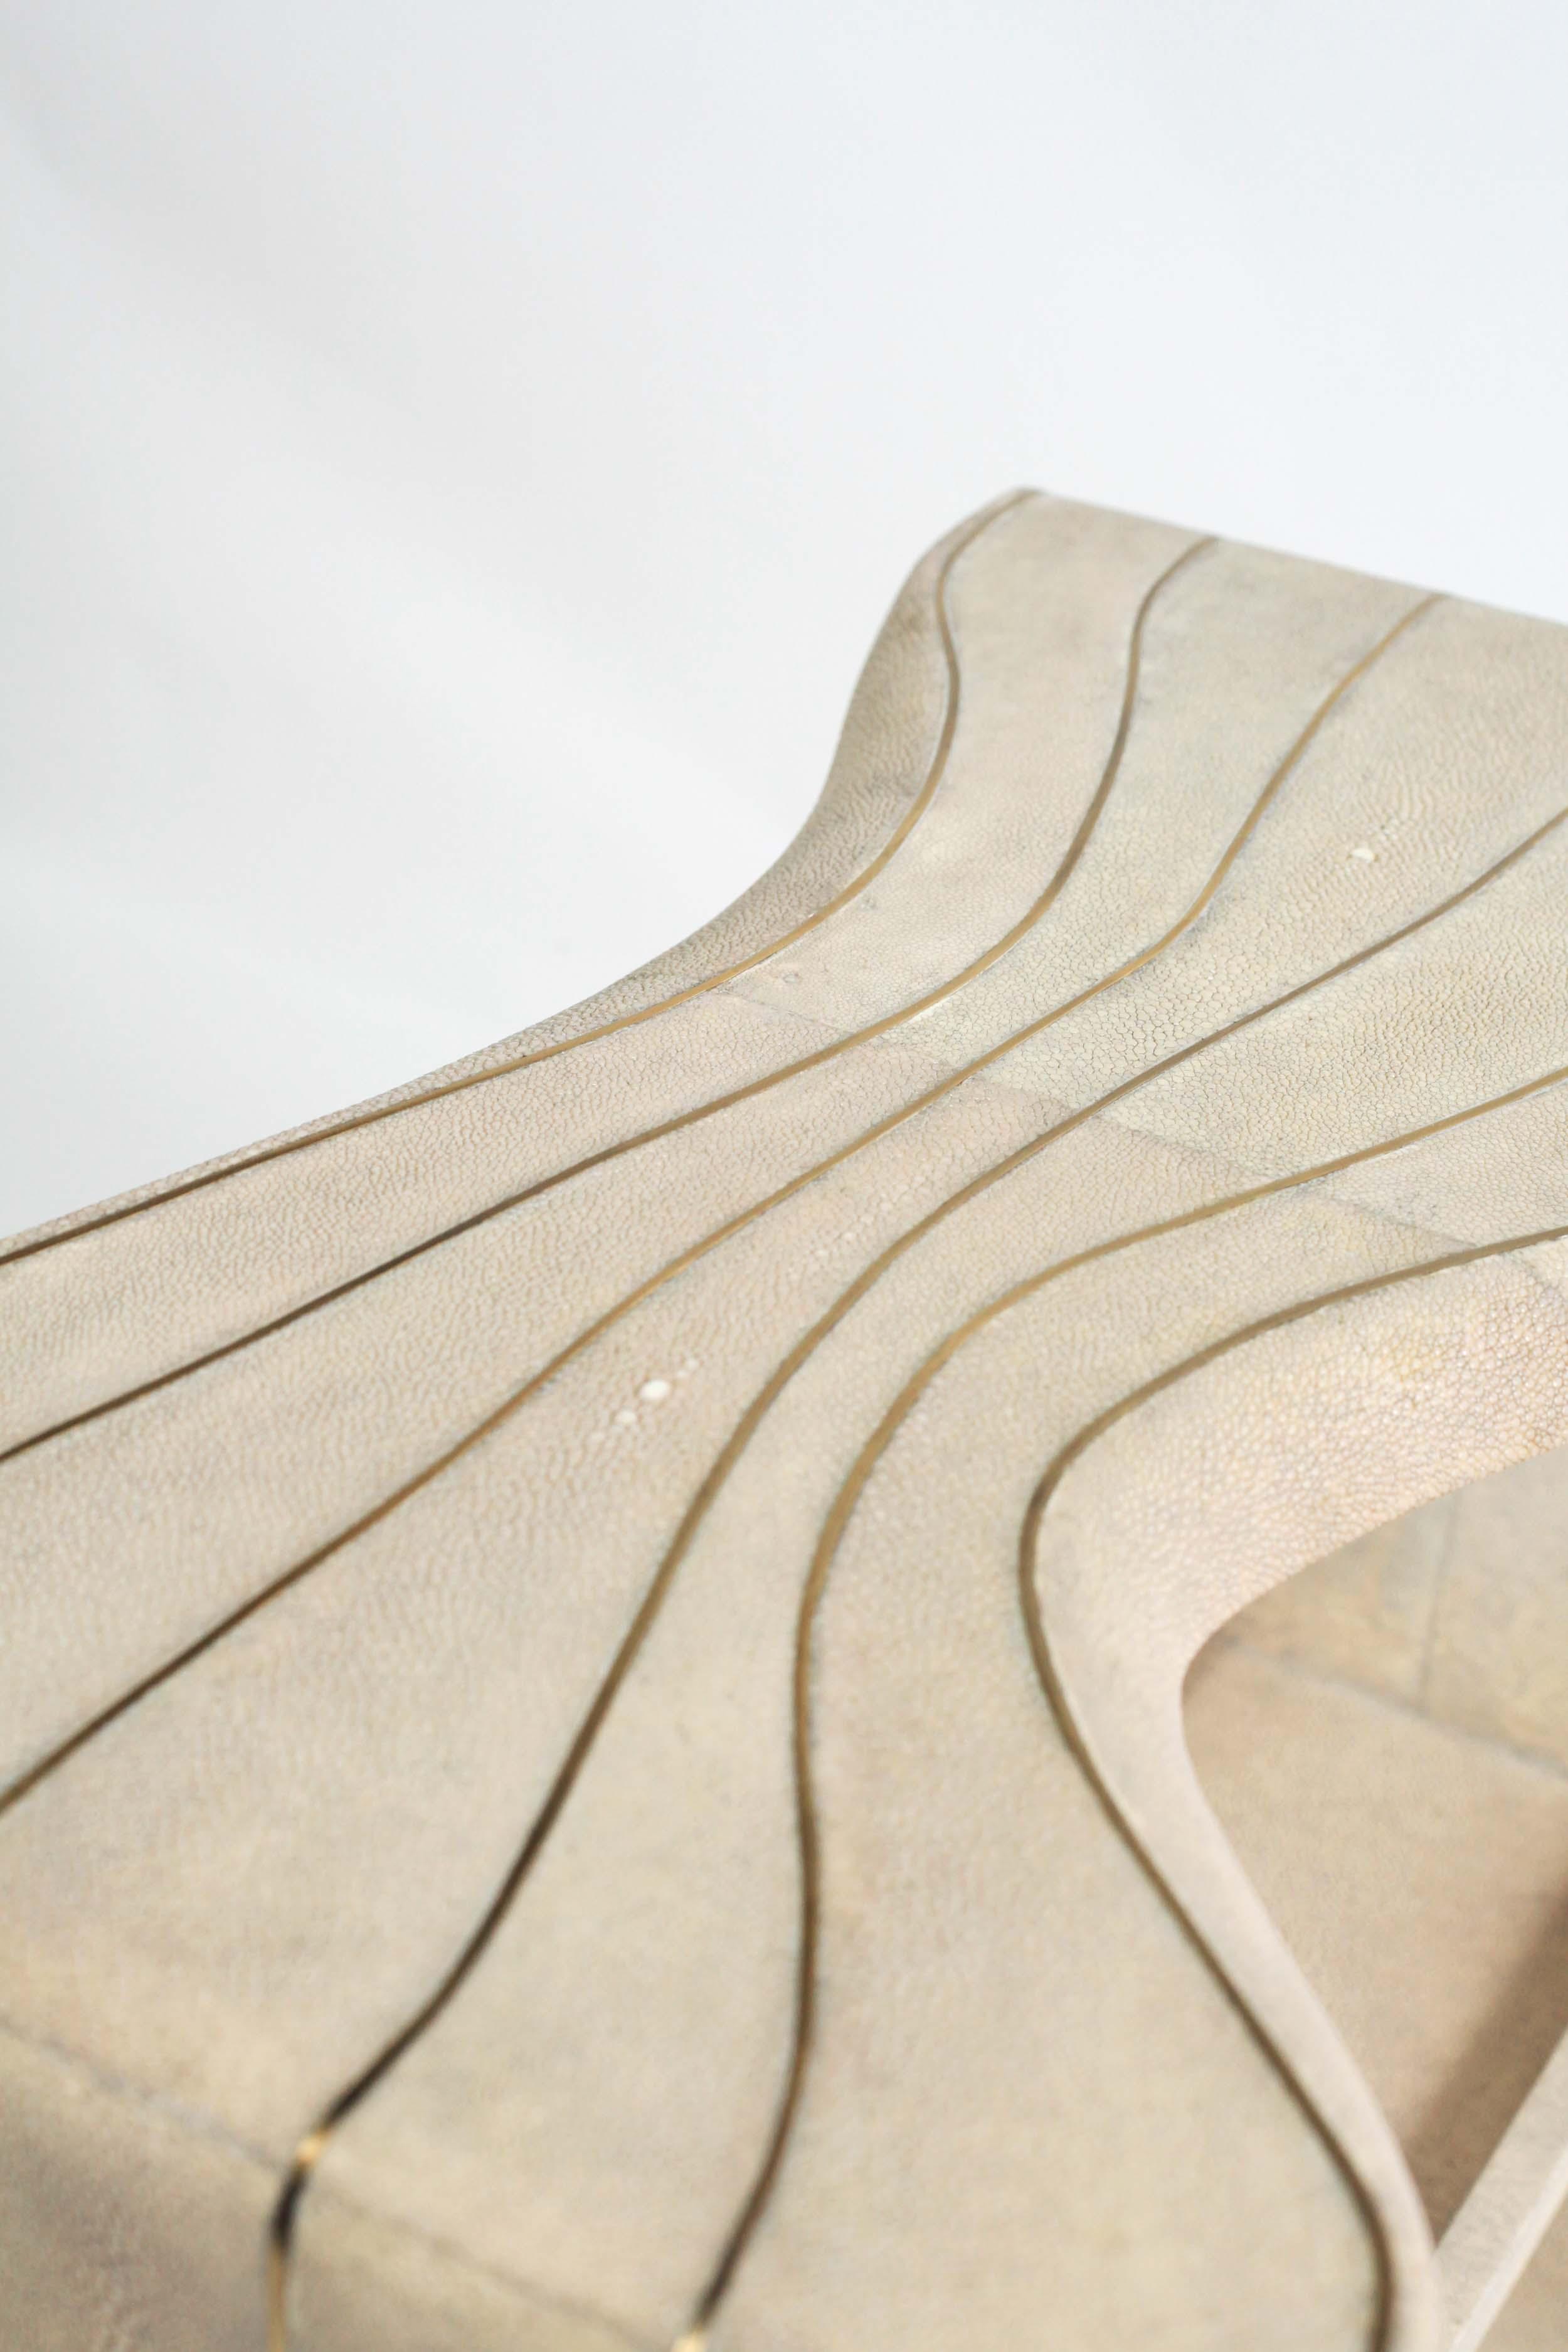 kifu-paris-materials-patterns-textures-shagreen-brass